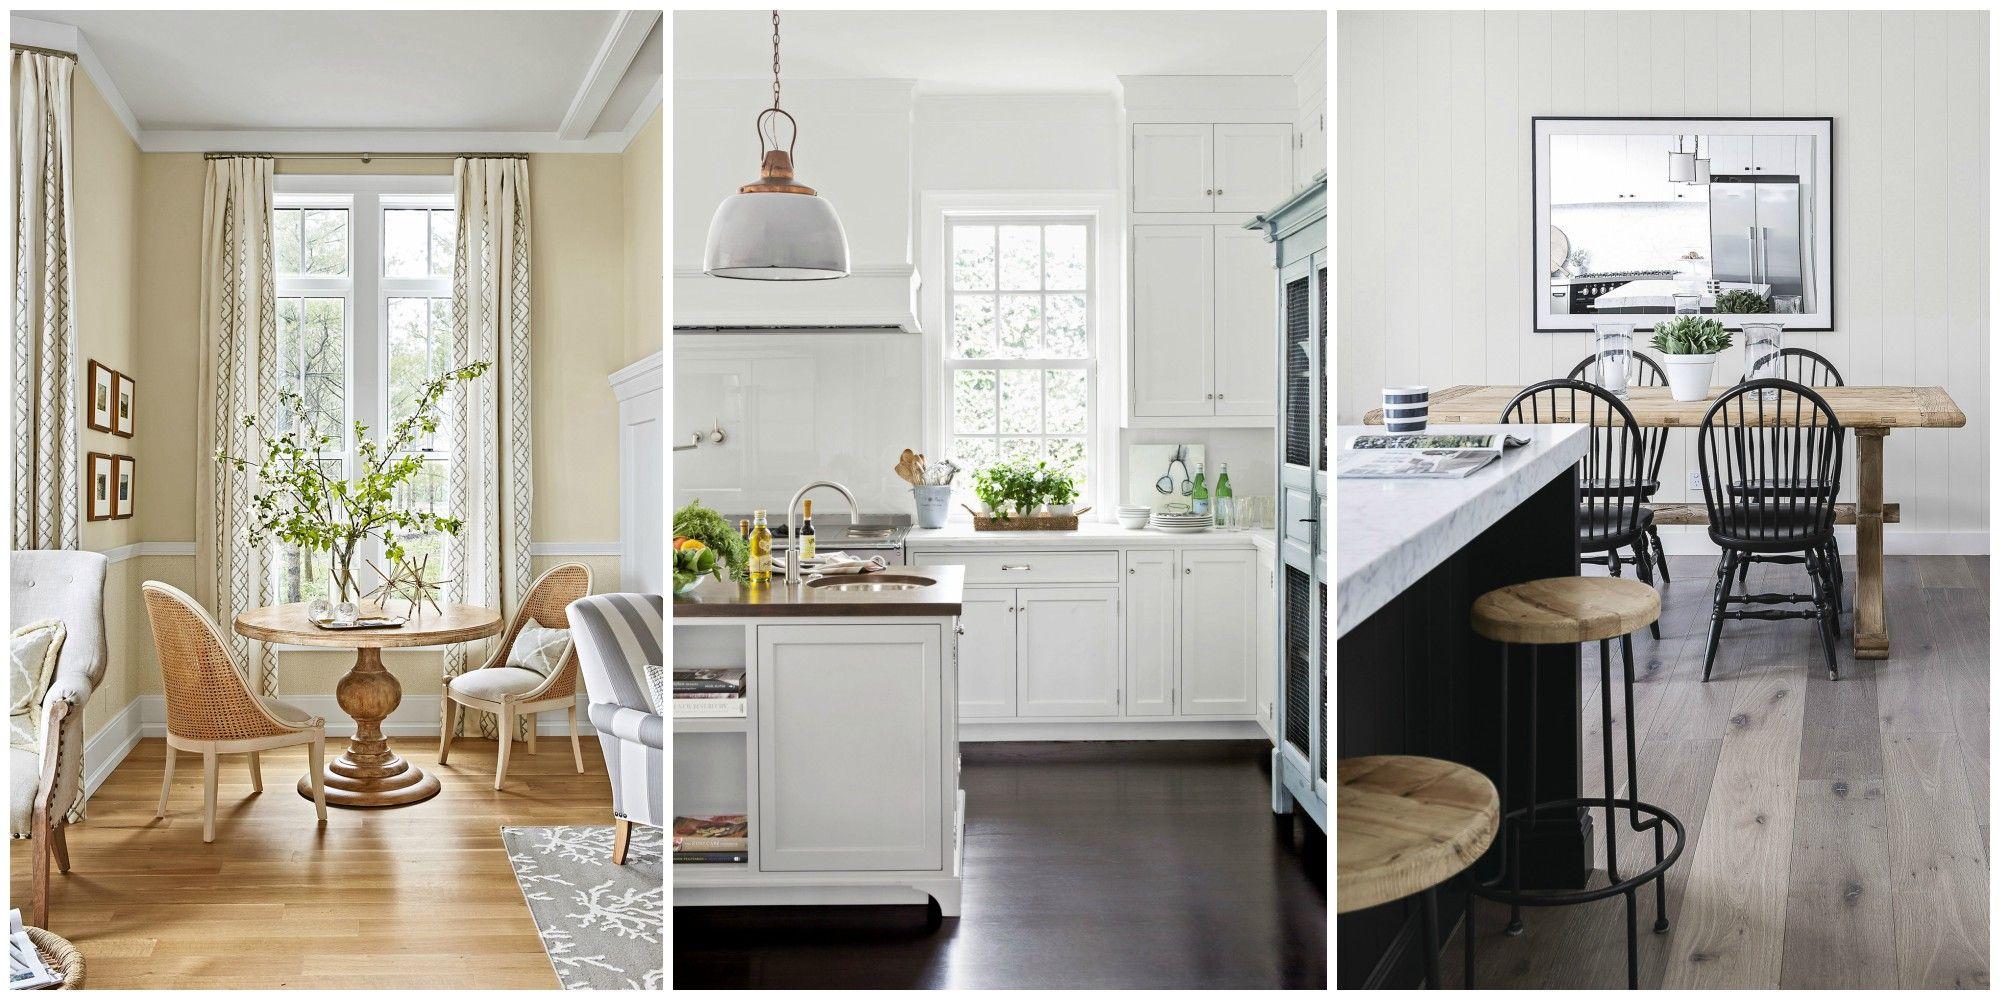 Diy Home Renovation Ideas. Amazing Small Kitchen Renovations Before ...